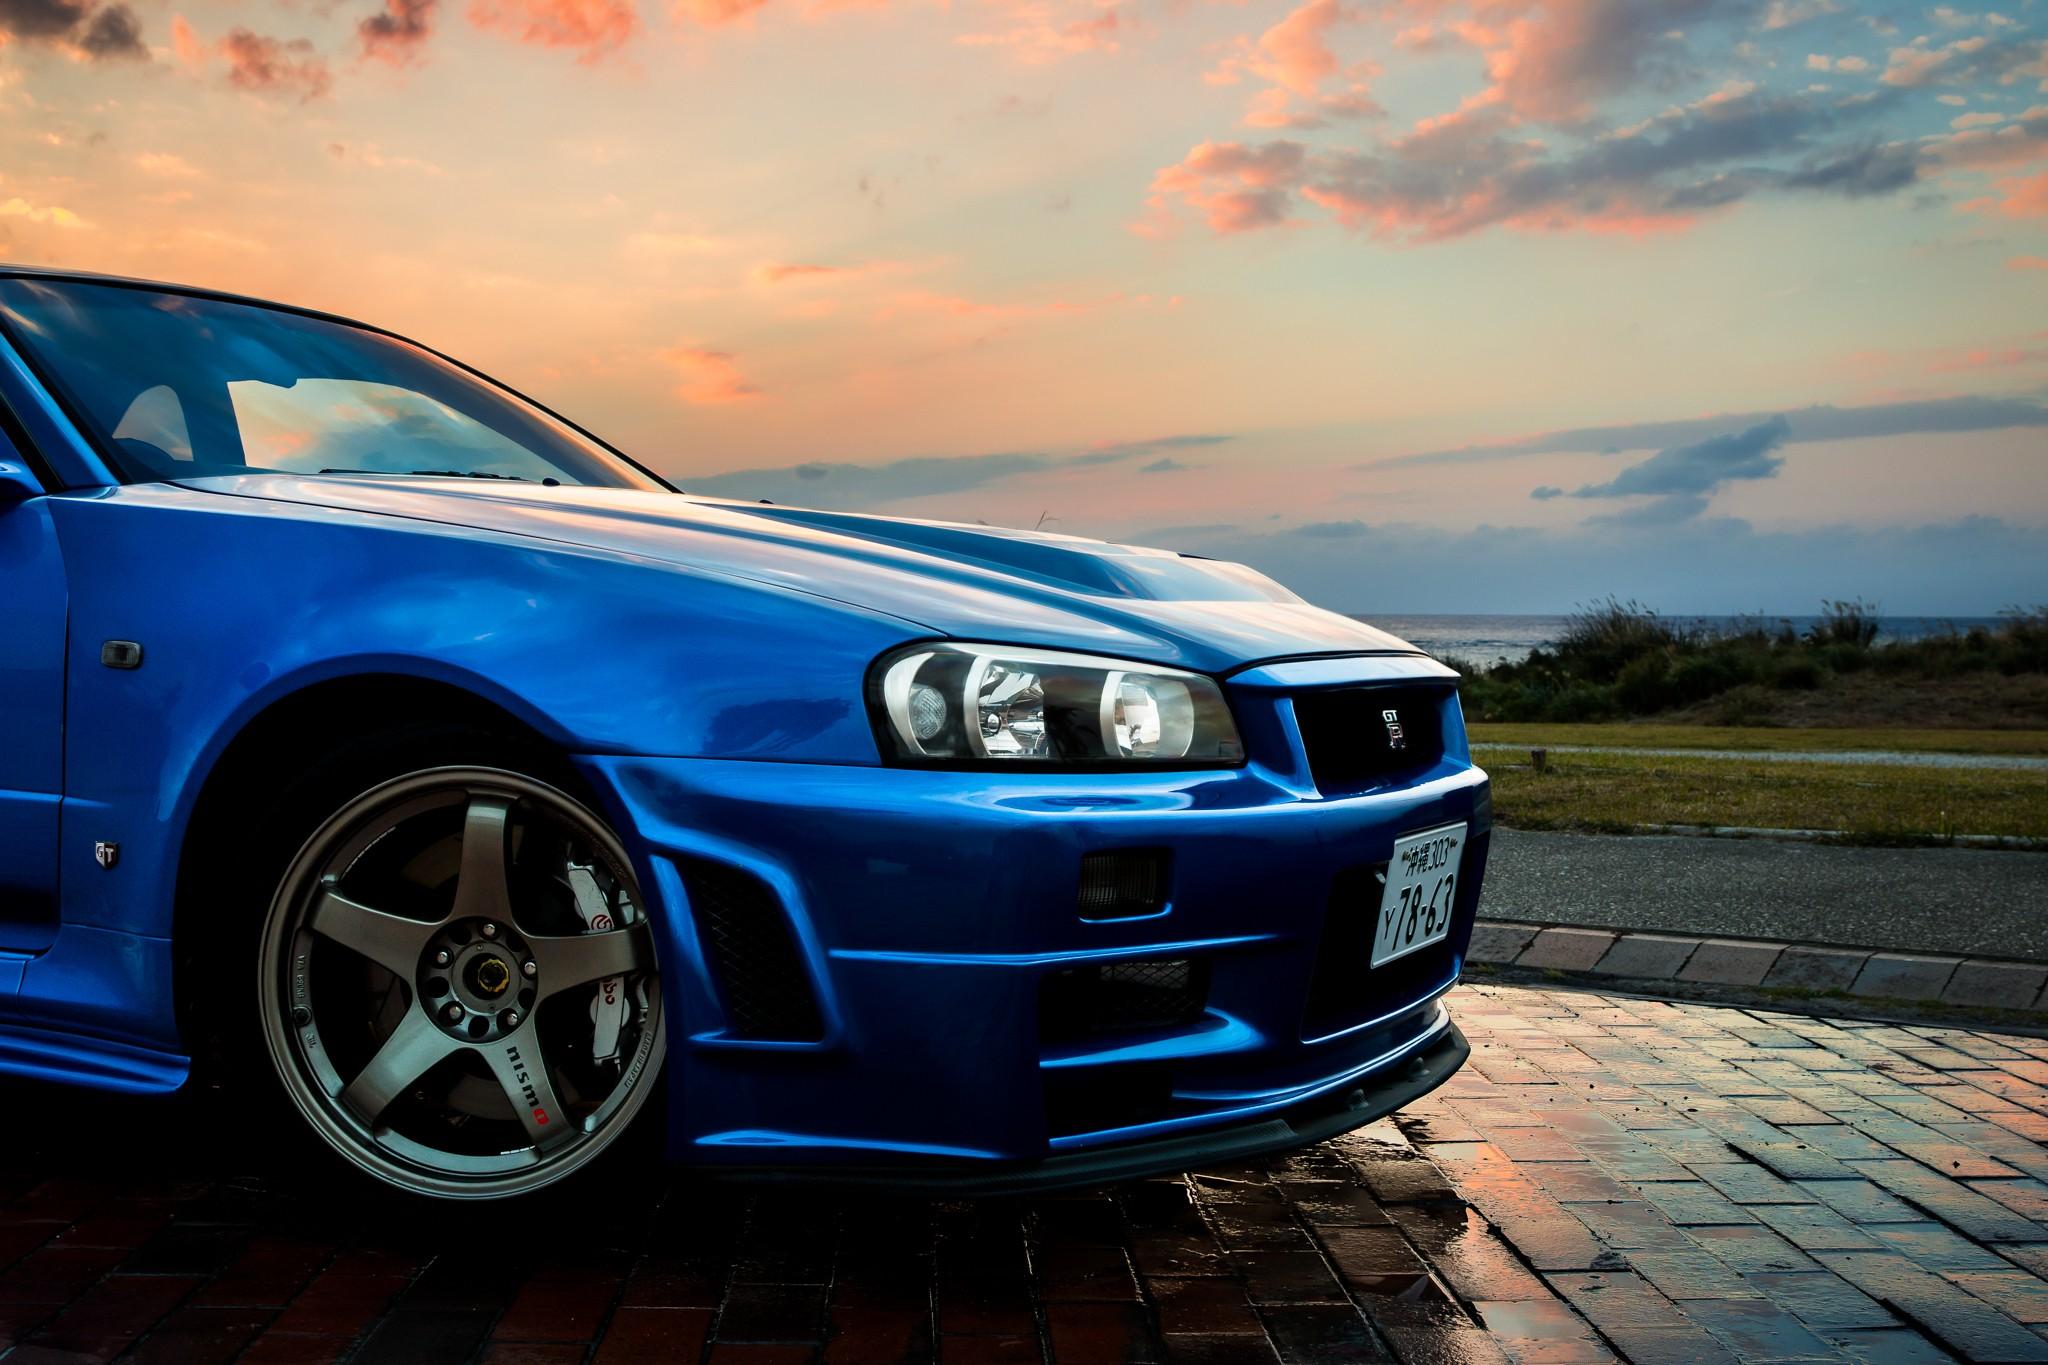 2048x1365 Px Blue Car JDM Nissan Skyline GT R R34